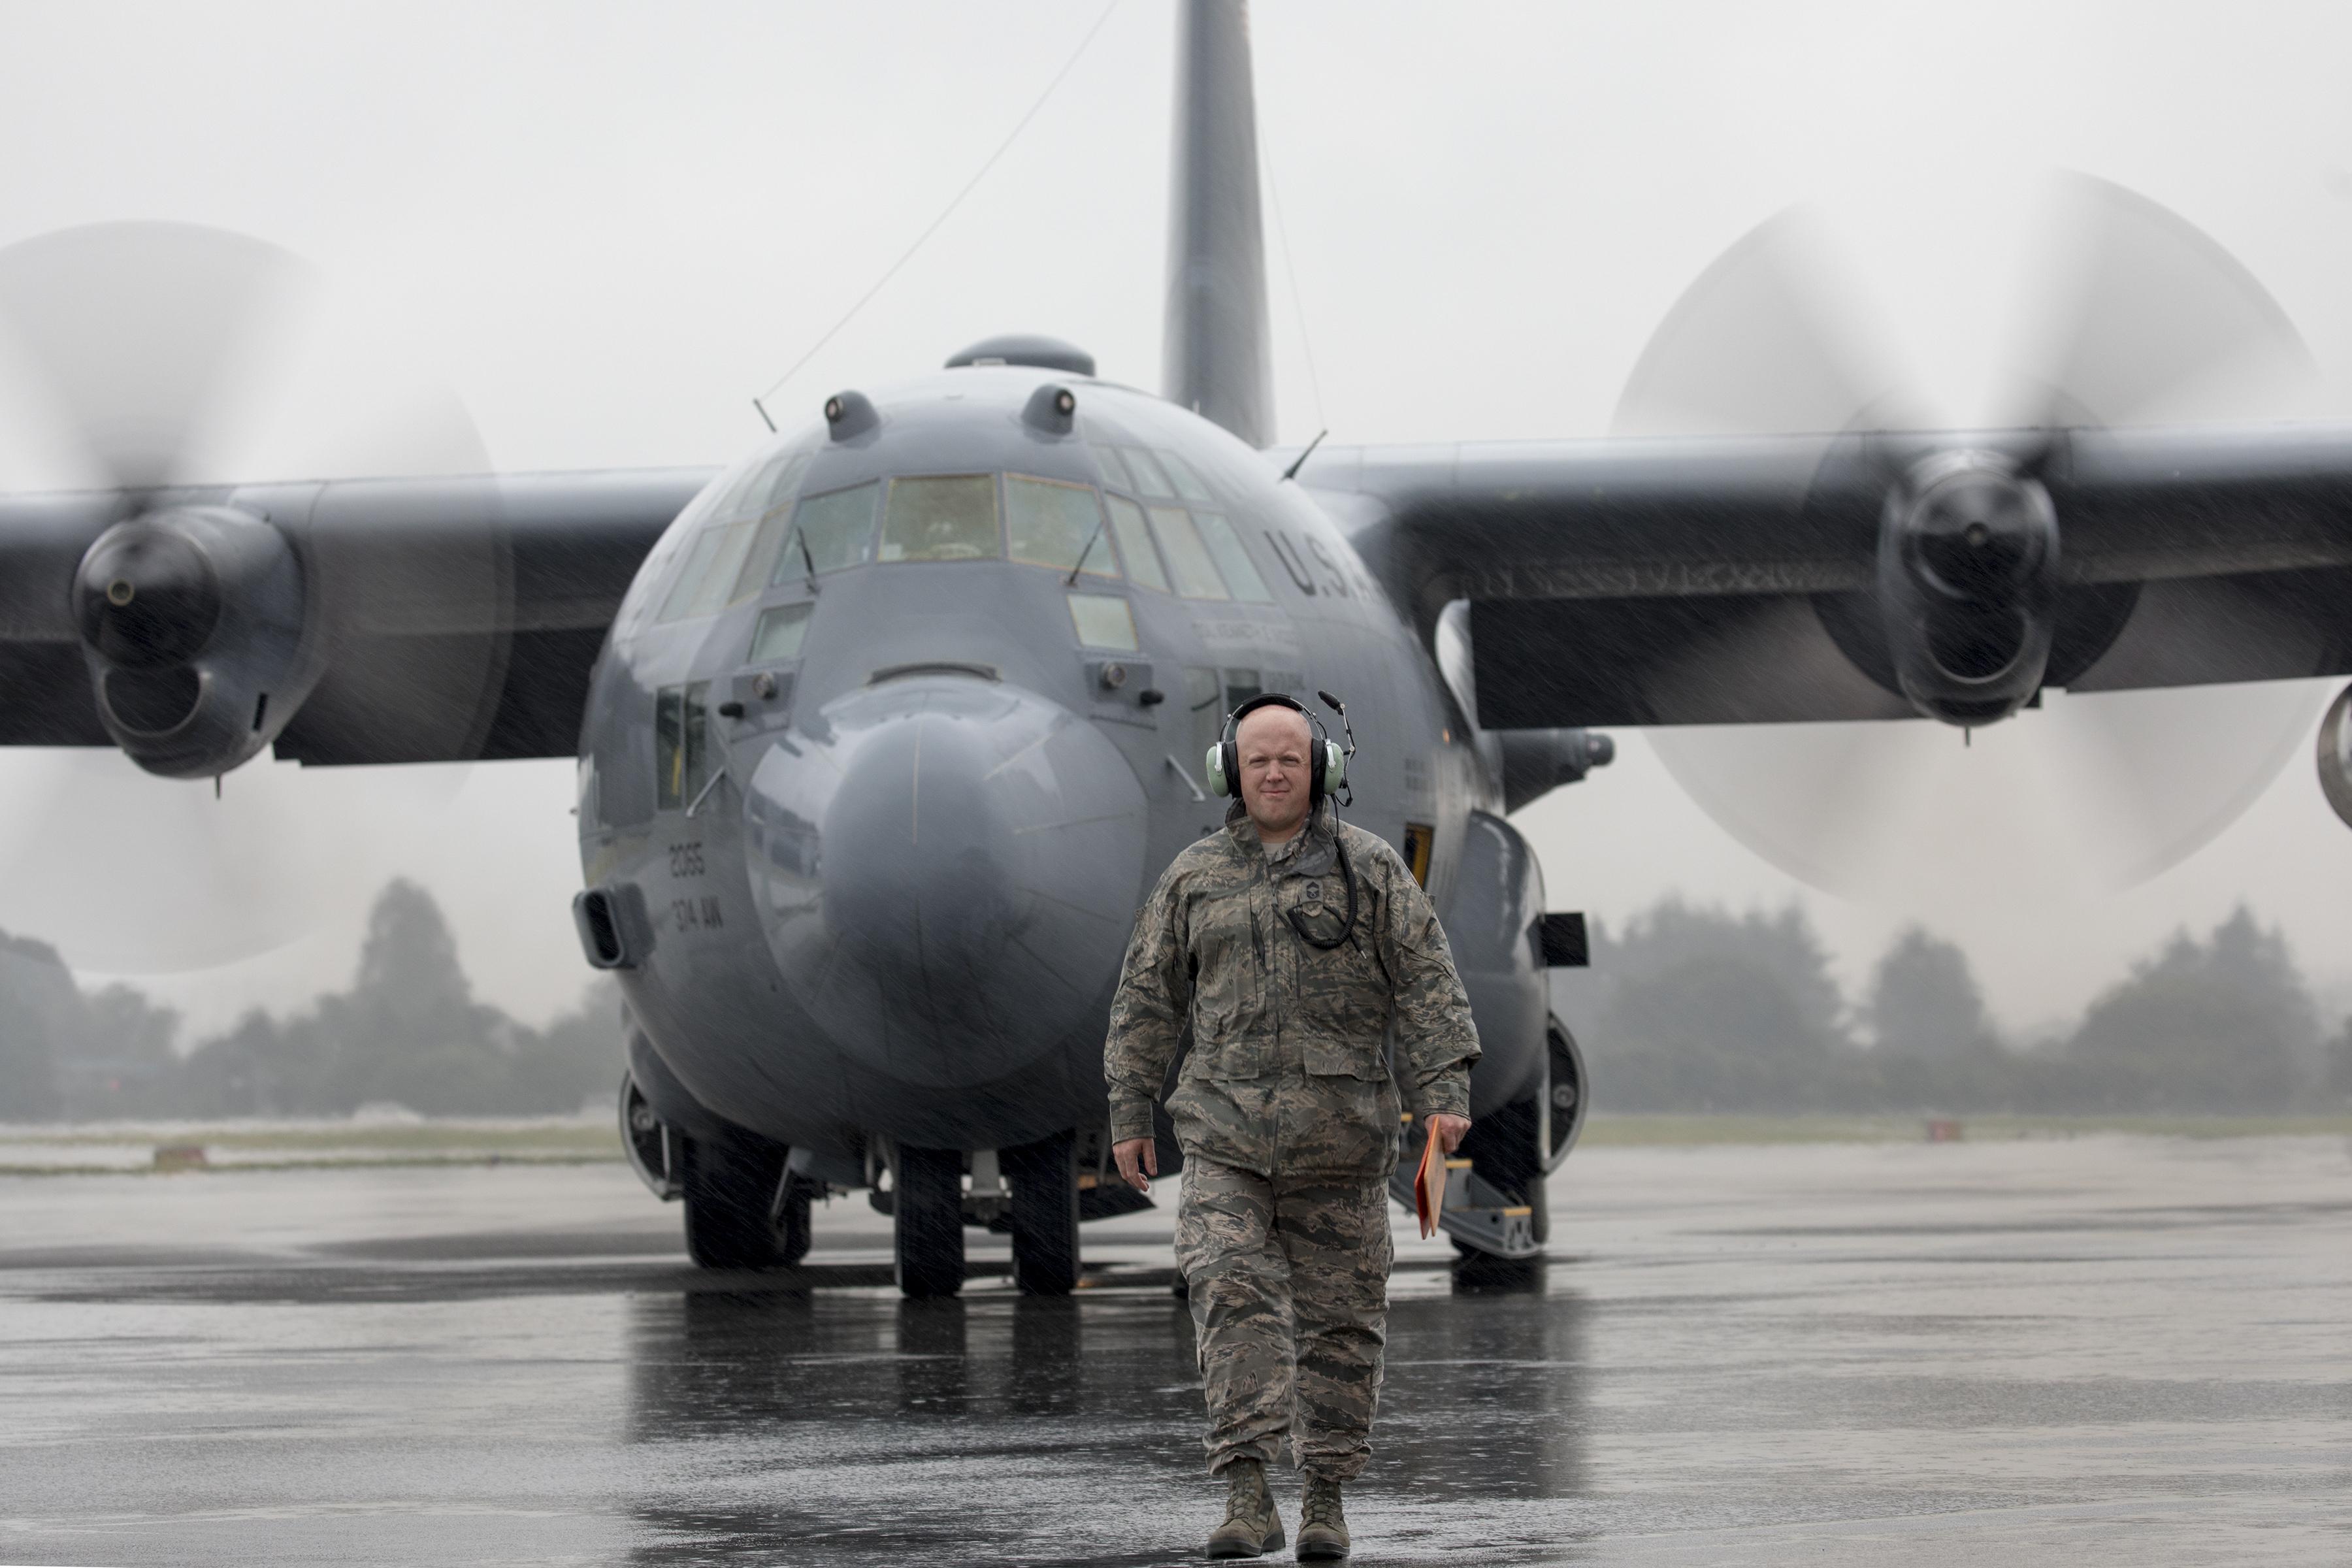 Chief Master Sgt. Eric Evers, 374th Aircraft Maintenance Squadron superintendent, walks on a ramp as he marshals a C-130H Hercules at Yokota Air Base, Japan, Oct. 16, 2017. (Yasuo Osakabe/Air Force)